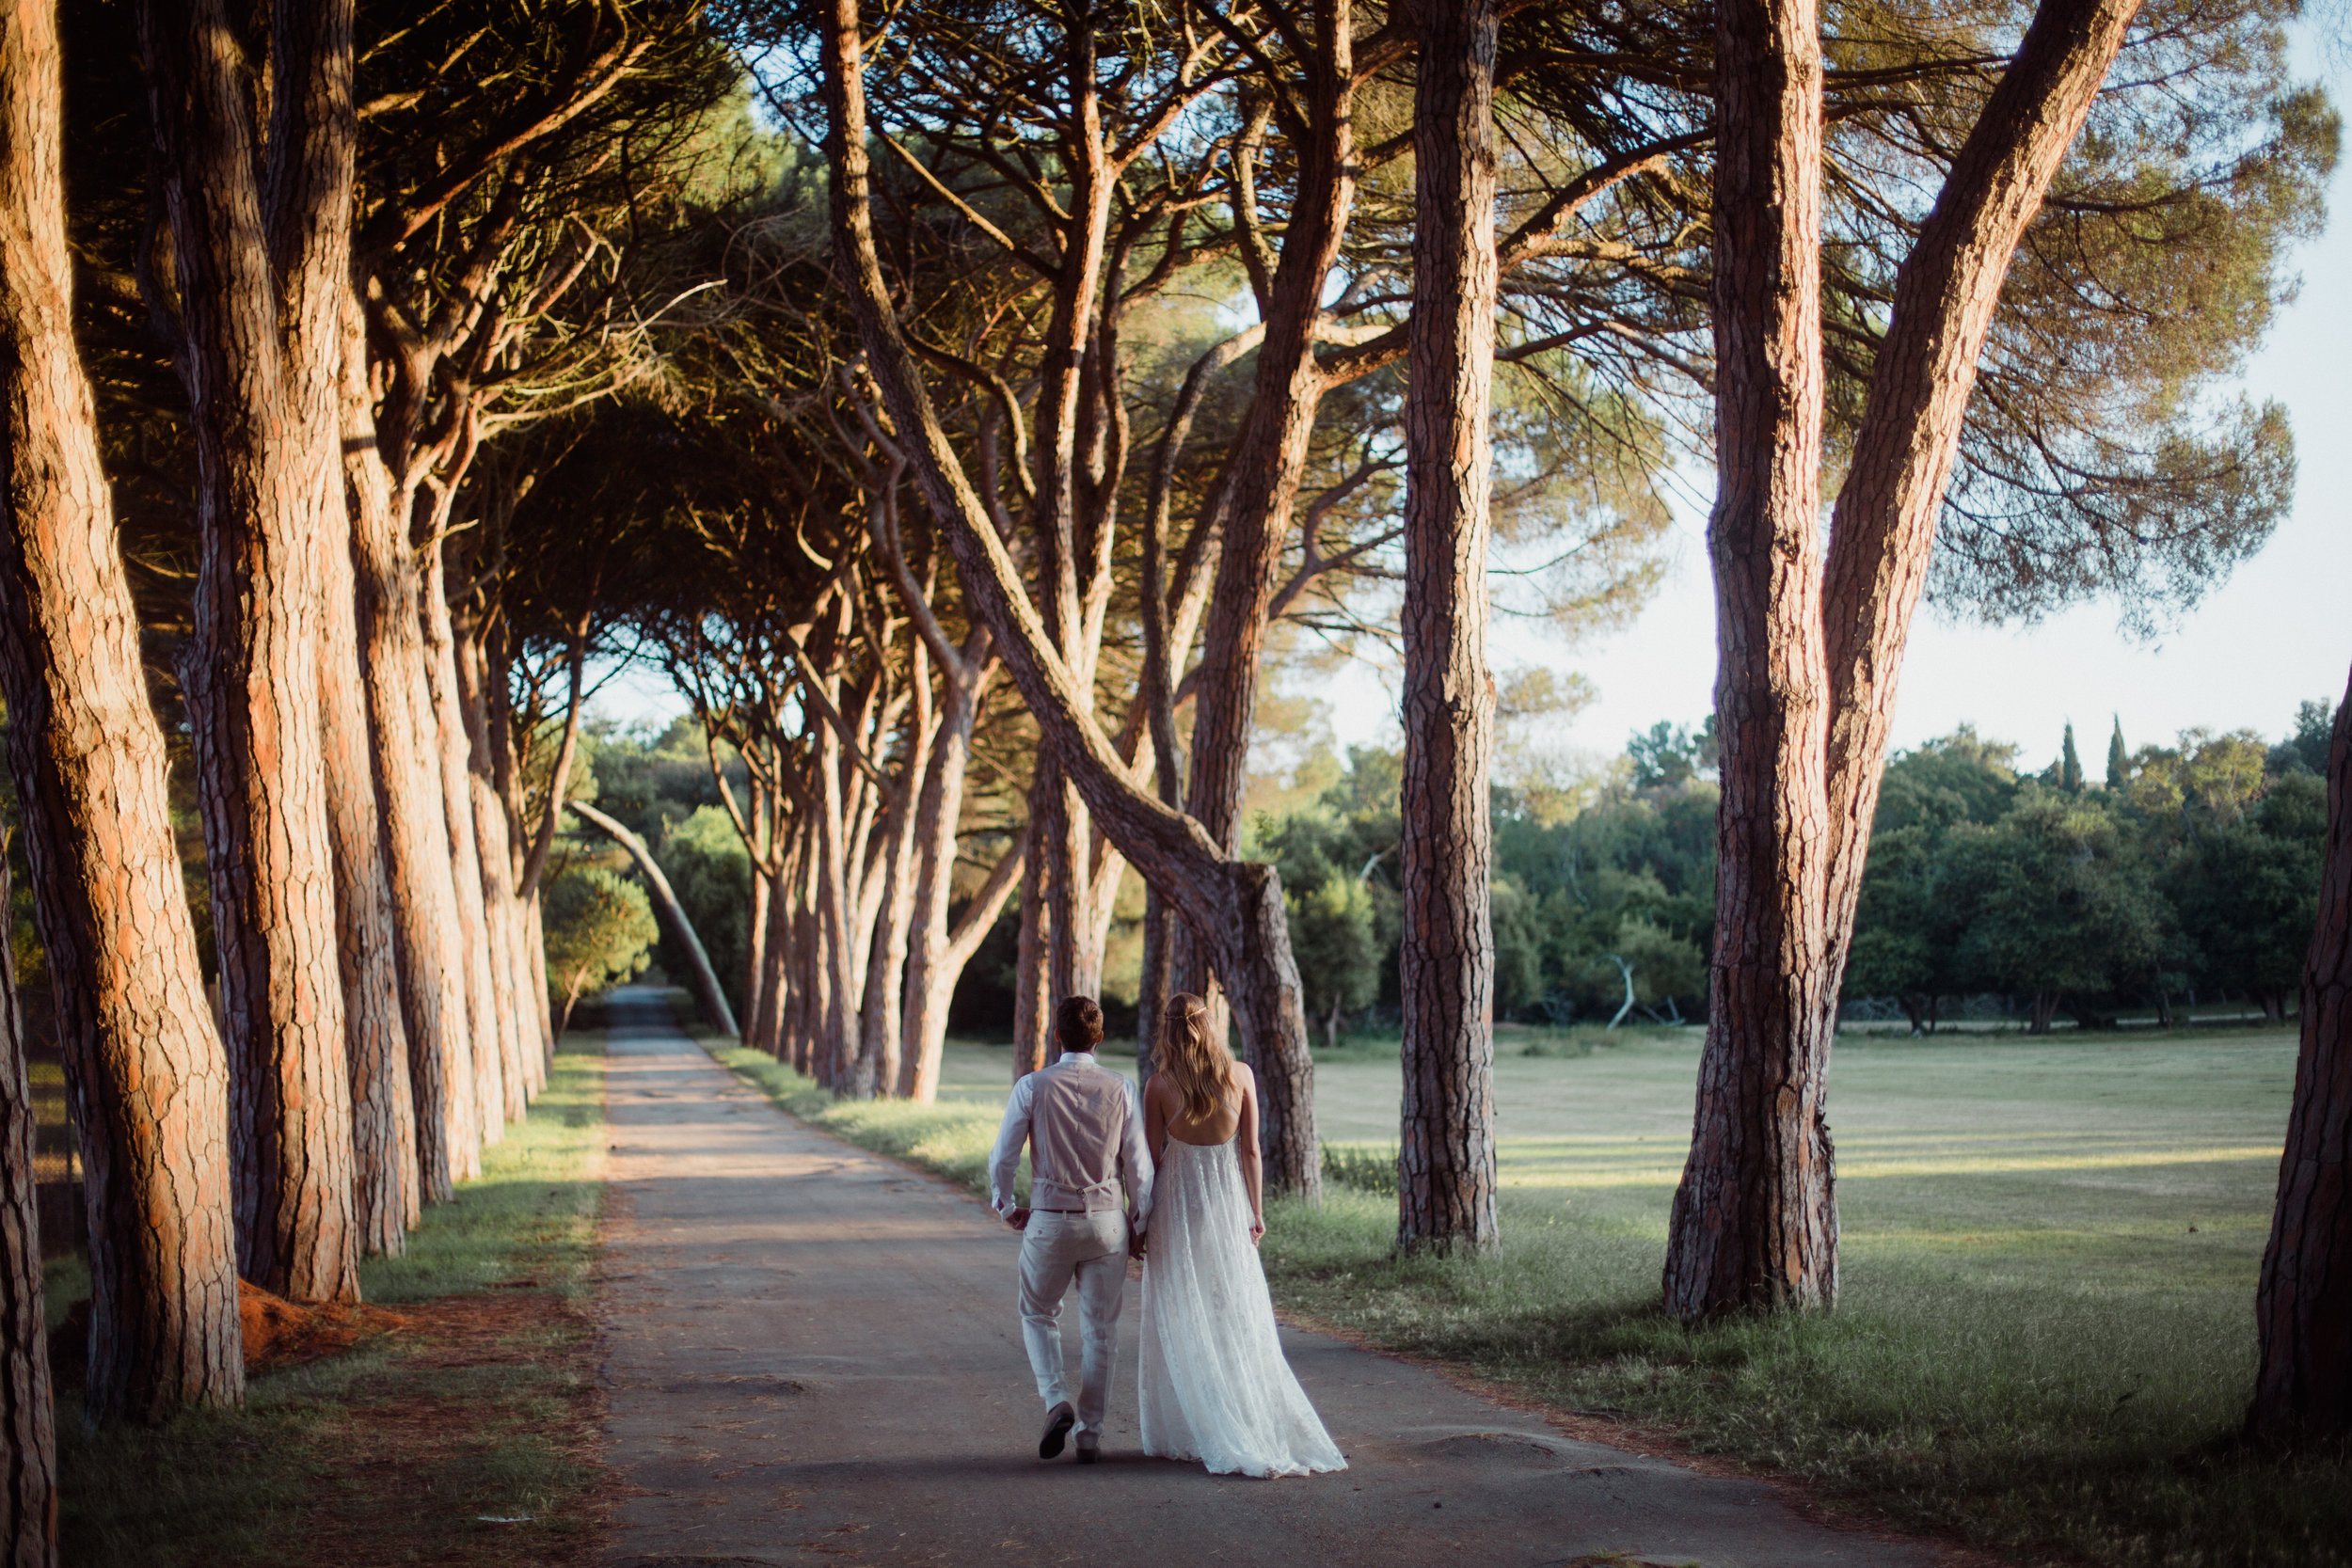 mariage-plage-croatie-ile-brijuni-mariage-paris-onzieme-arrondissement-photographe-france-pauline-maroussia